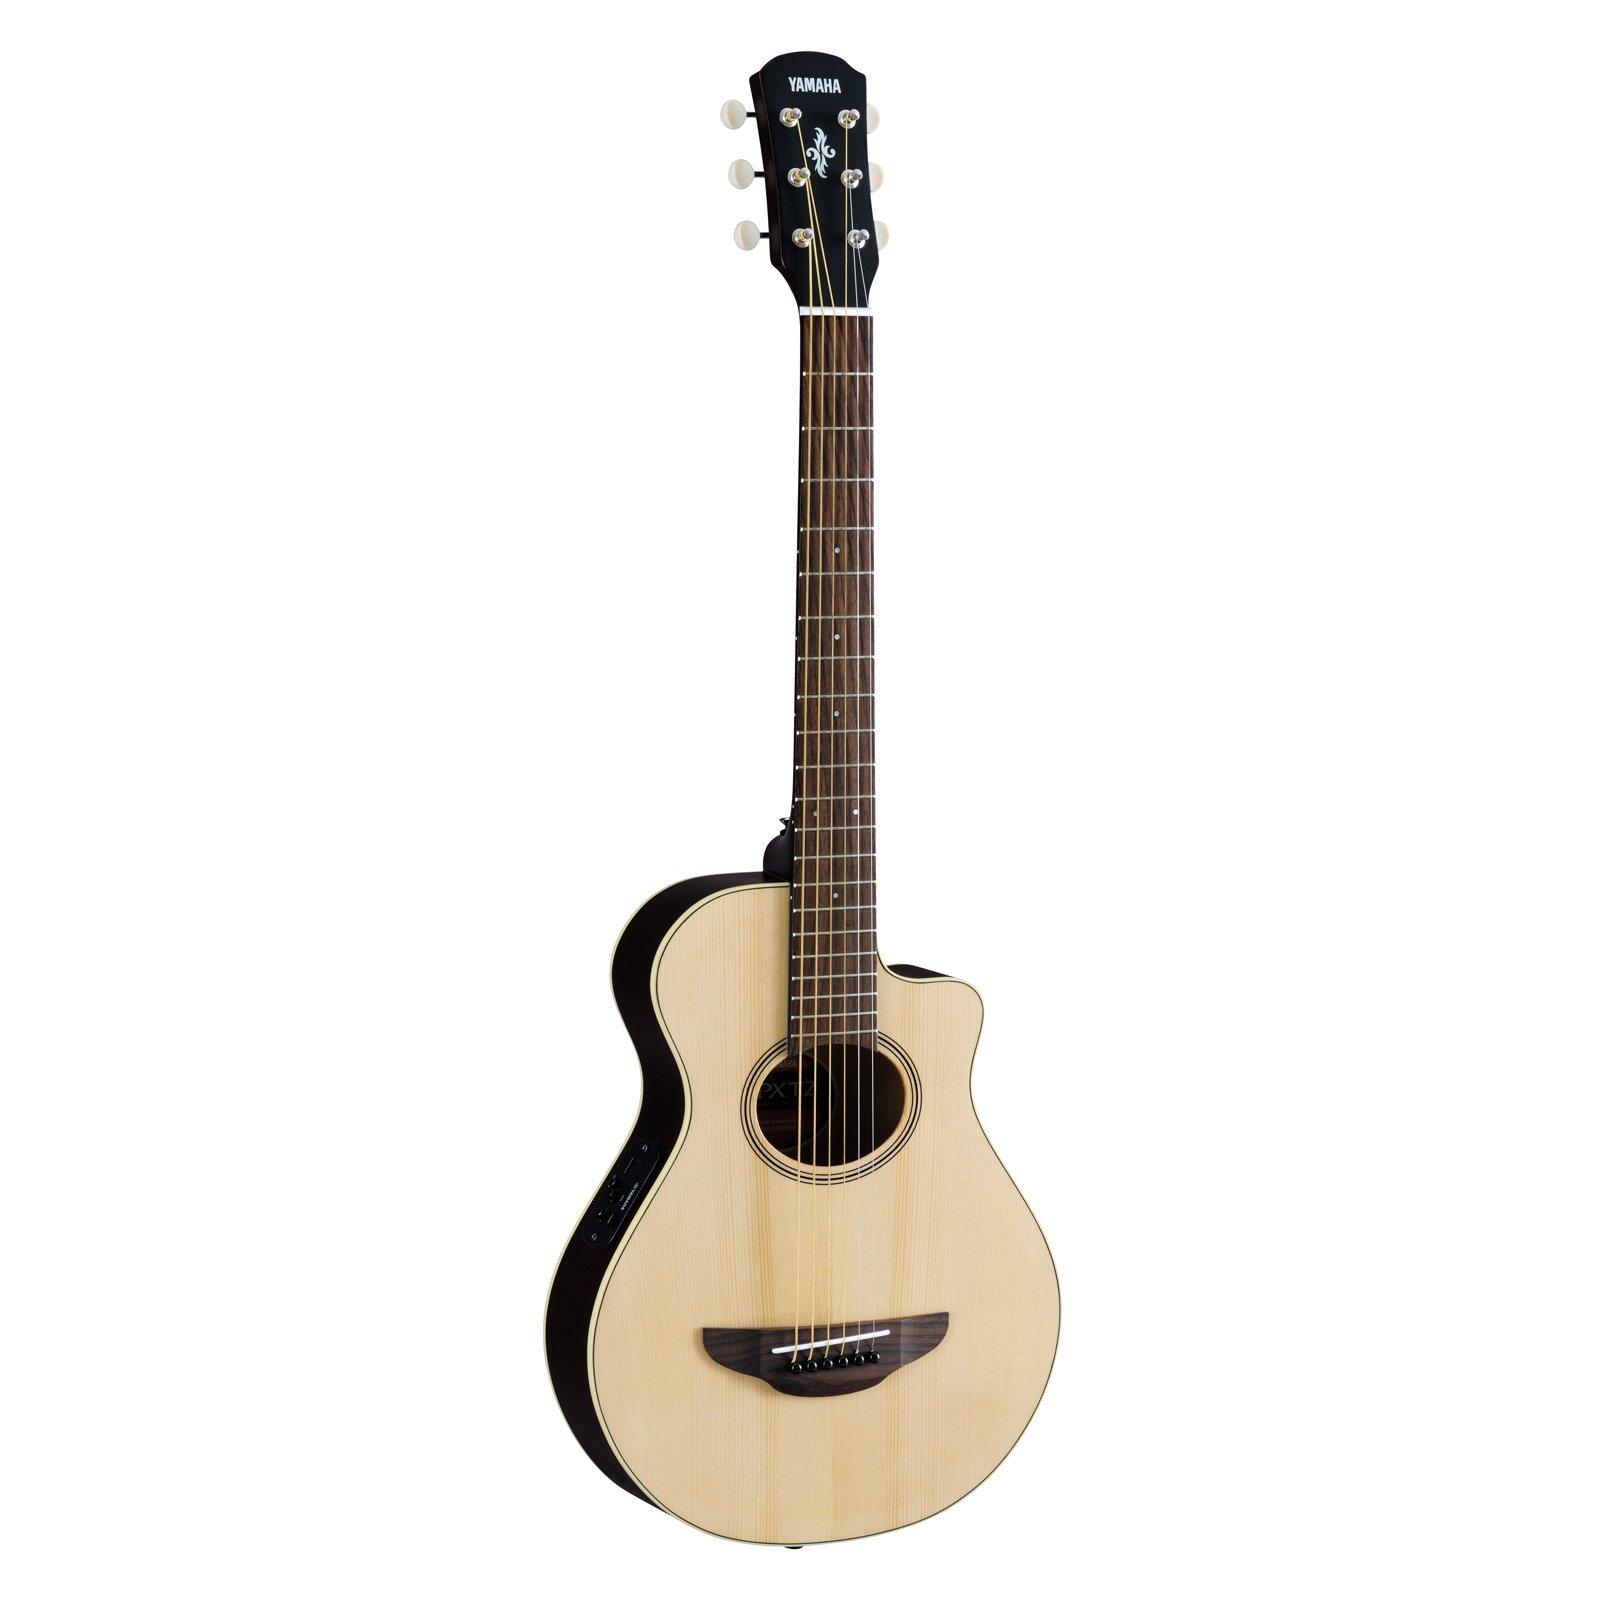 Yamaha 3/4 Size Acoustic Electric Cutaway Guitar w/Gigbag- Natural